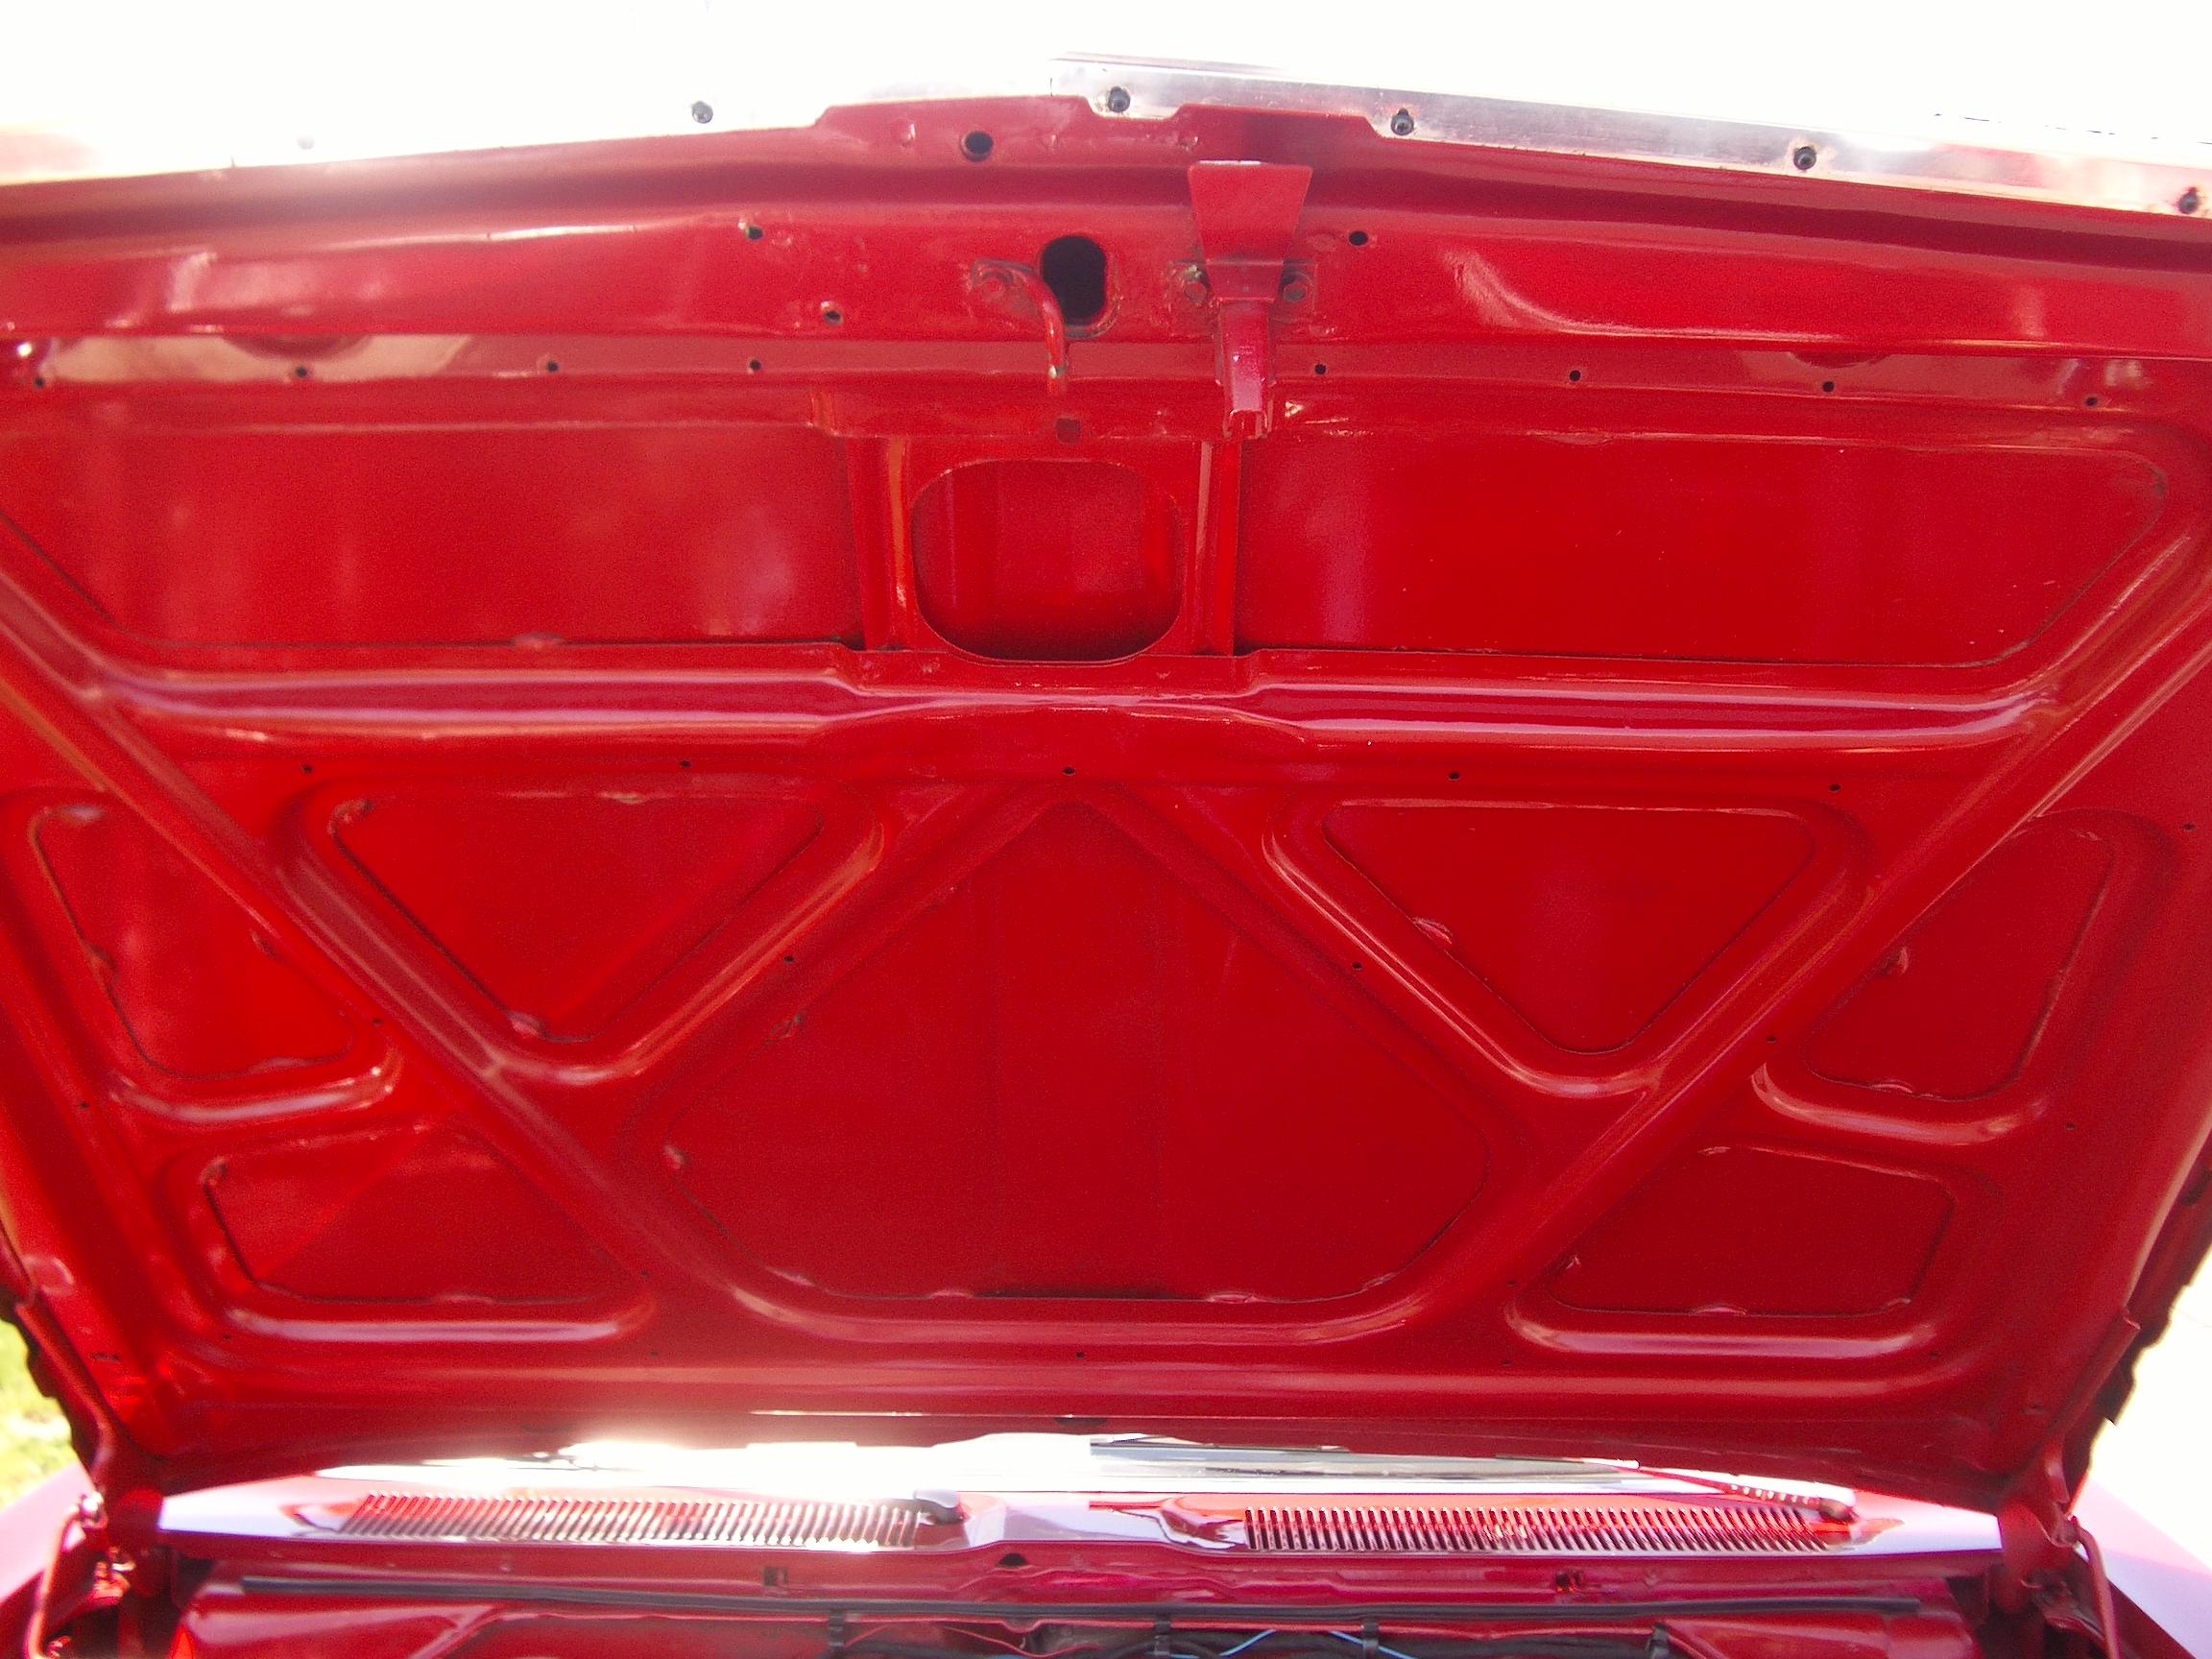 1968 Plymouth Fury convertible hood